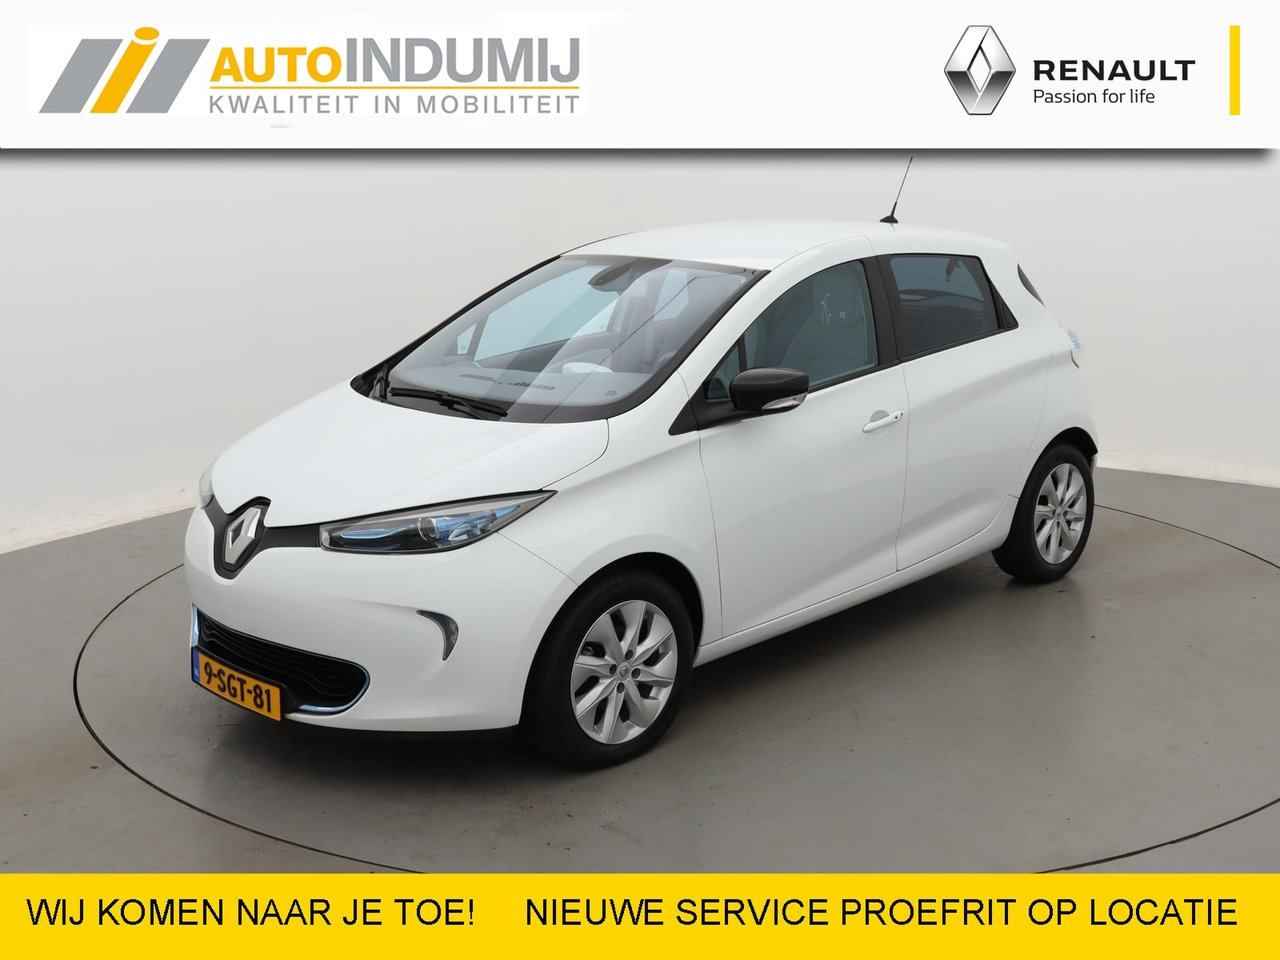 RenaultZoe - Q210 Zen Quickcharge 22 kWh (ex Accu) // Navi / Climate Control / Cruise Control / Sensore